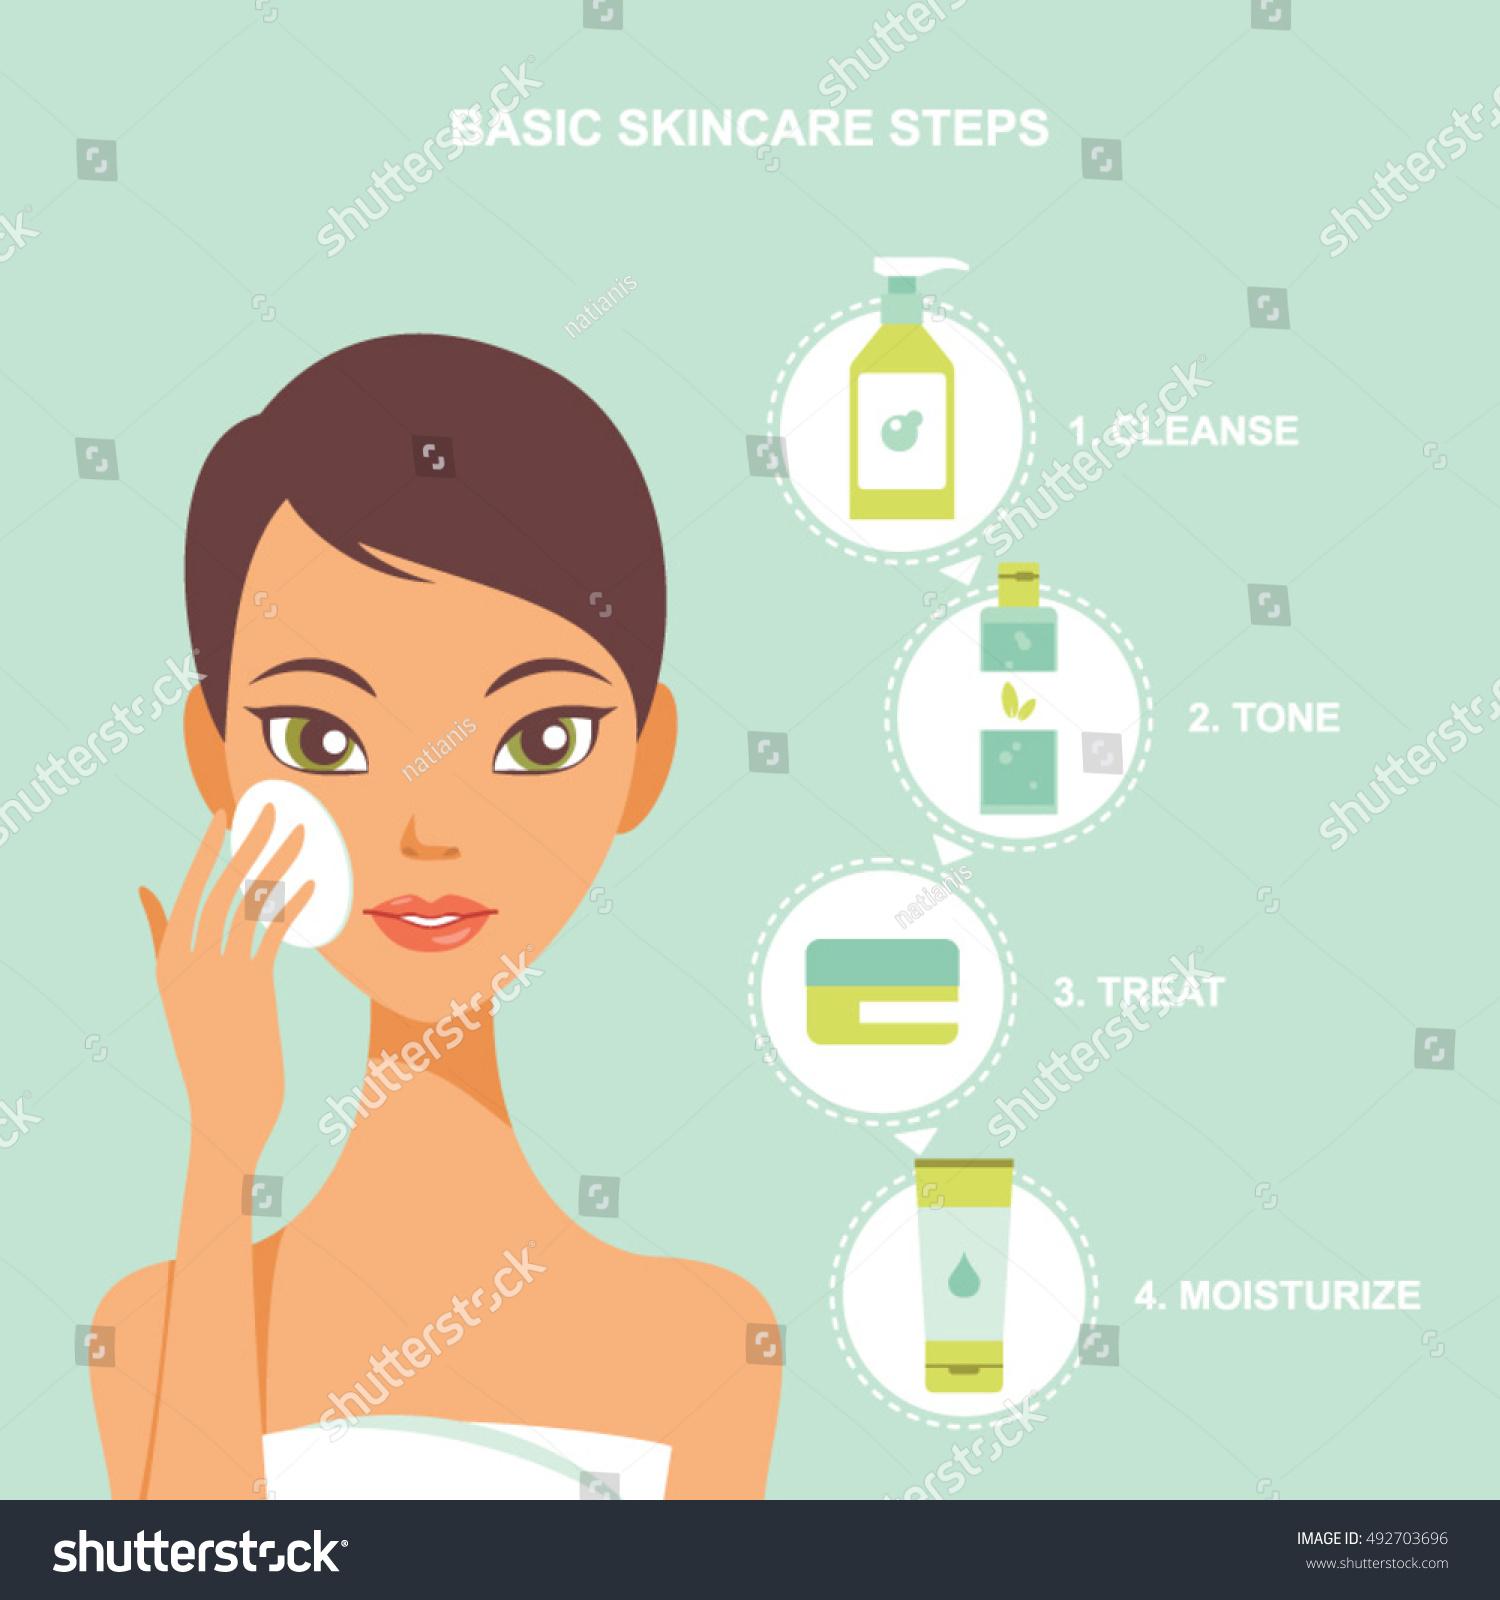 Skin Care Infographic: Skin Care Beauty Regimen Steps Vector Stock Vector